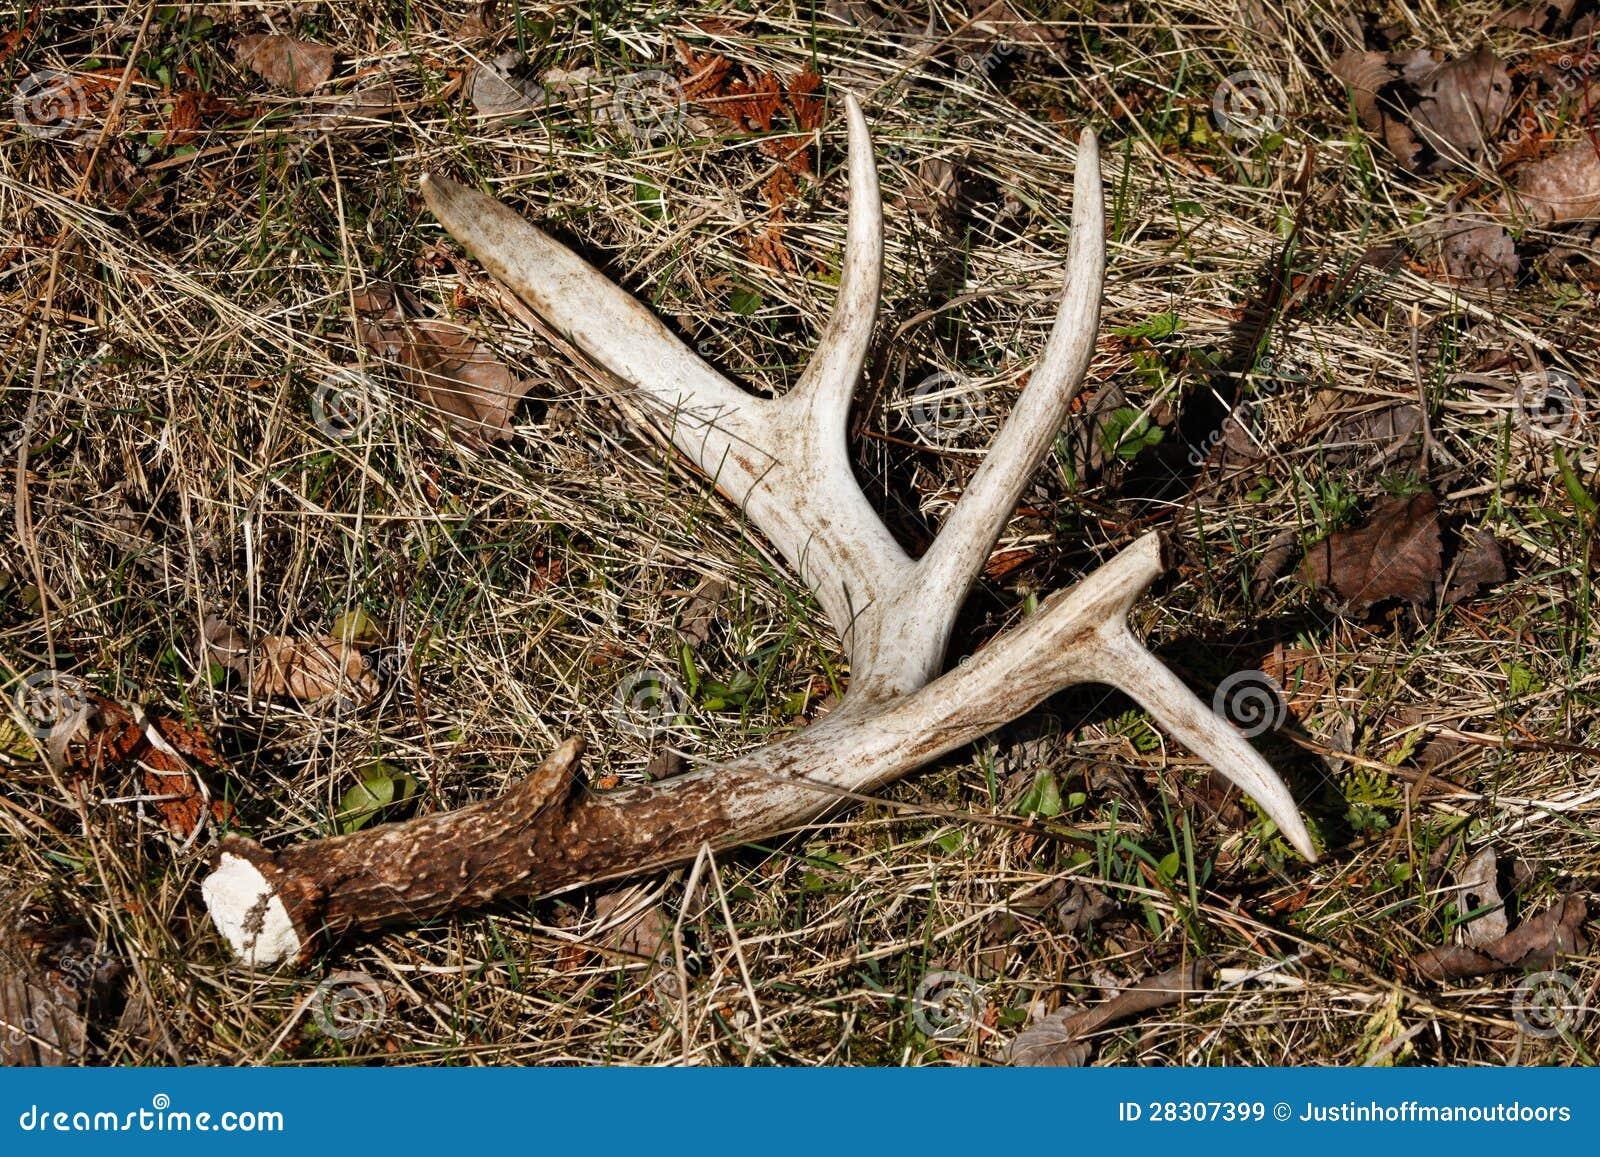 Whitetail Deer Antler Shed On Ground Stock Image Image